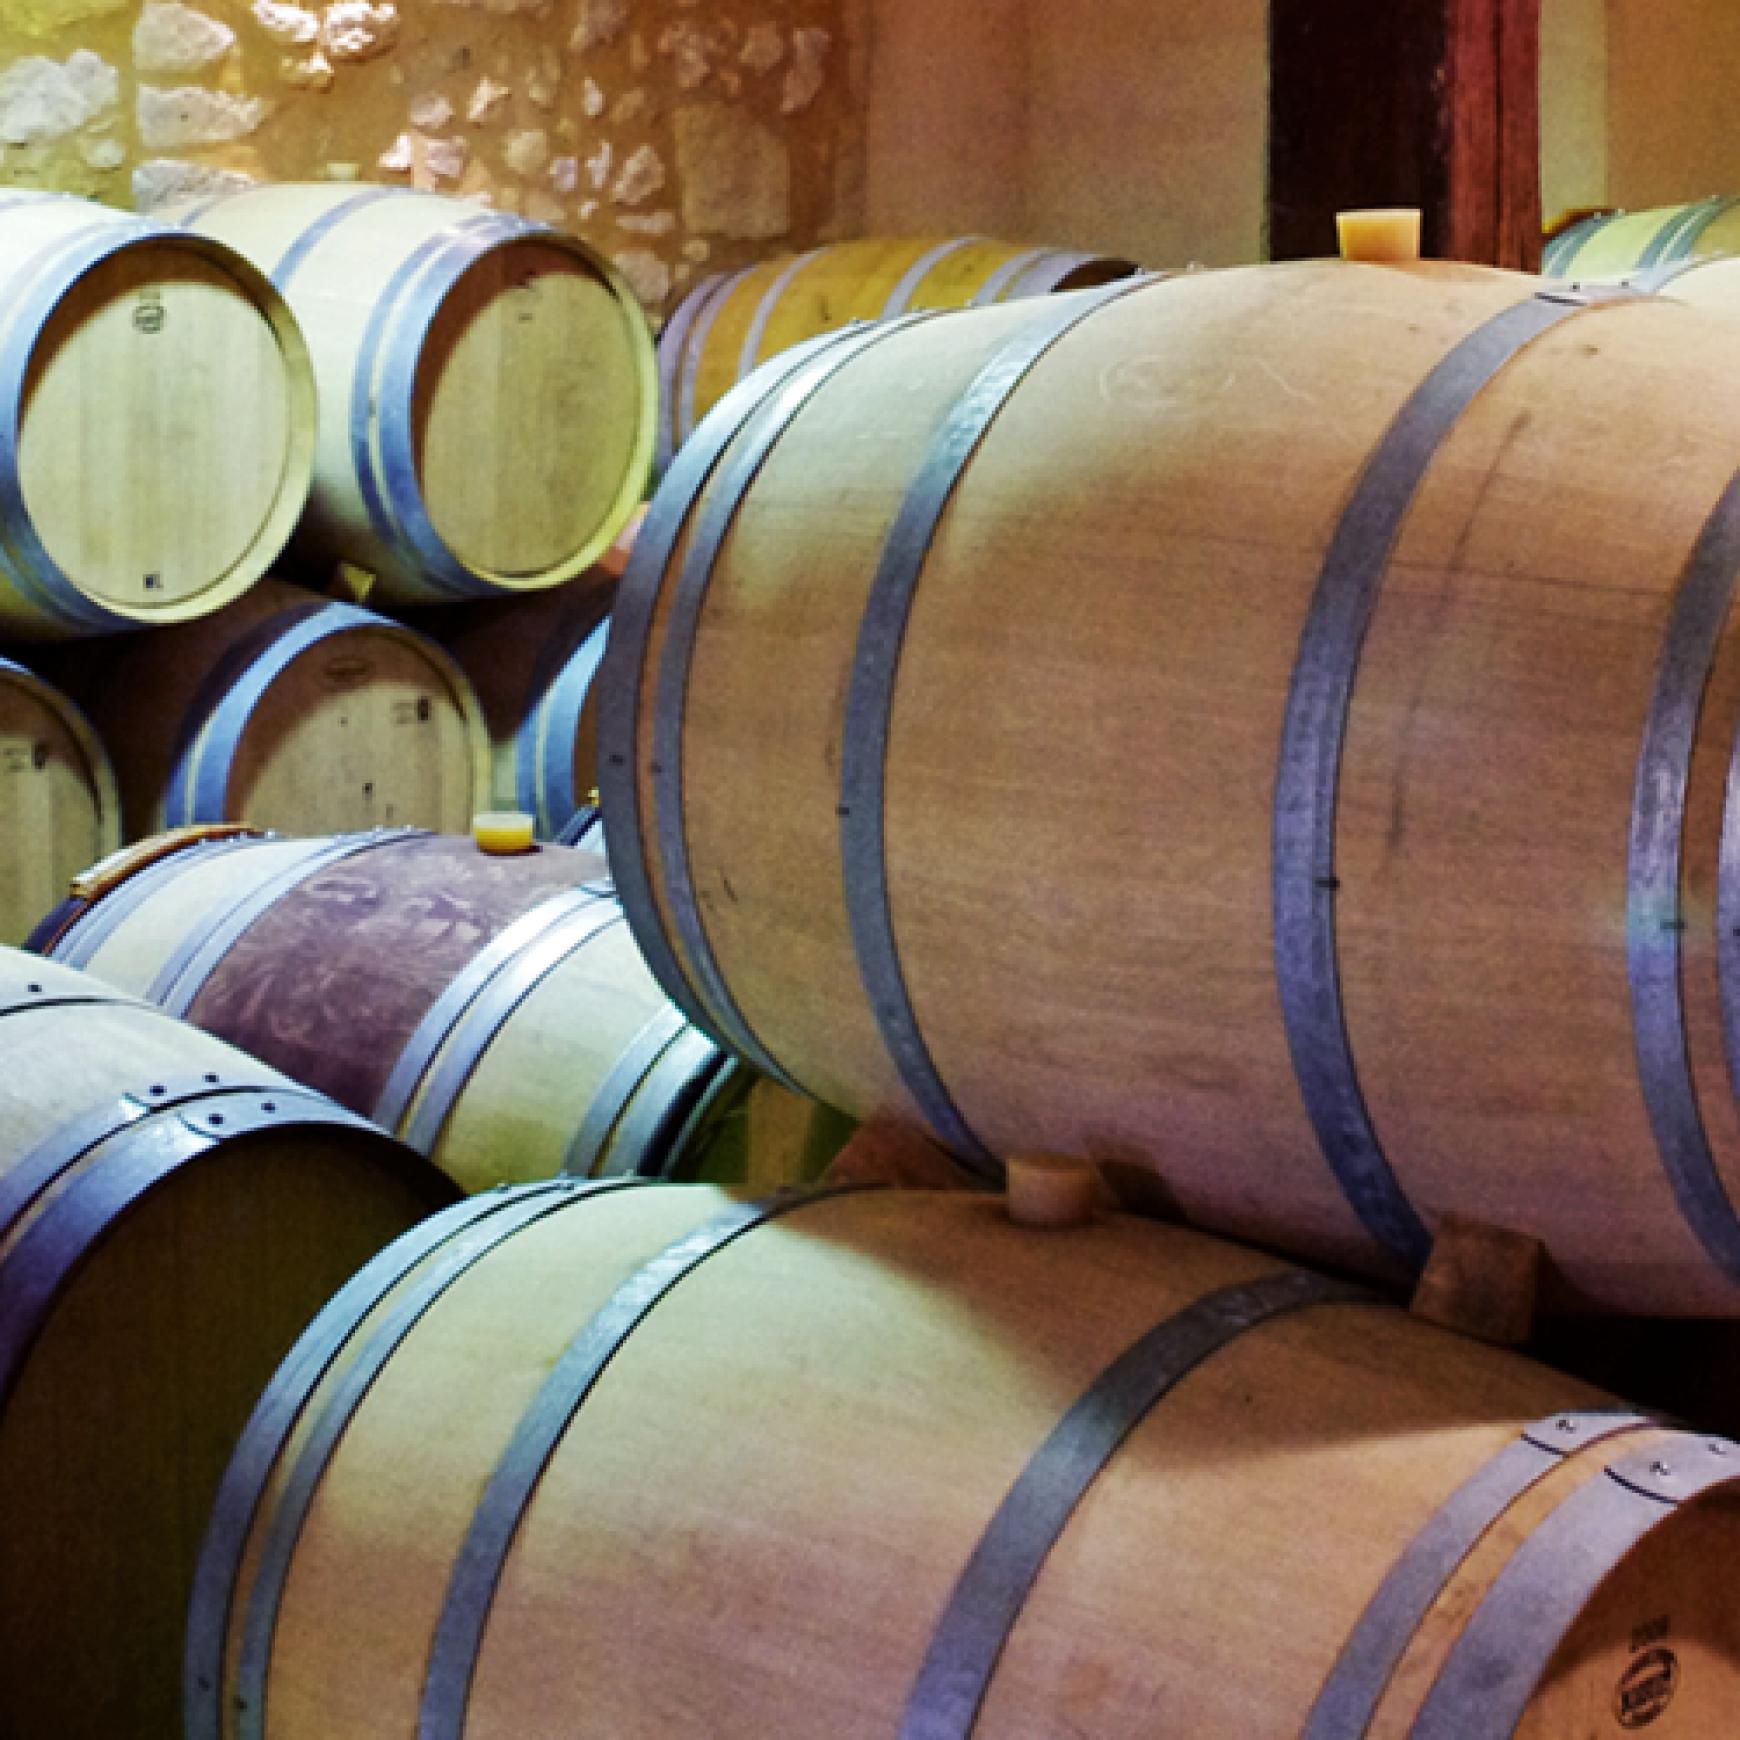 #7 Geschichten aus Bordeaux – Direkt an der (Wein-)Quelle: Jahrgangsrück- und -ausblick 2018